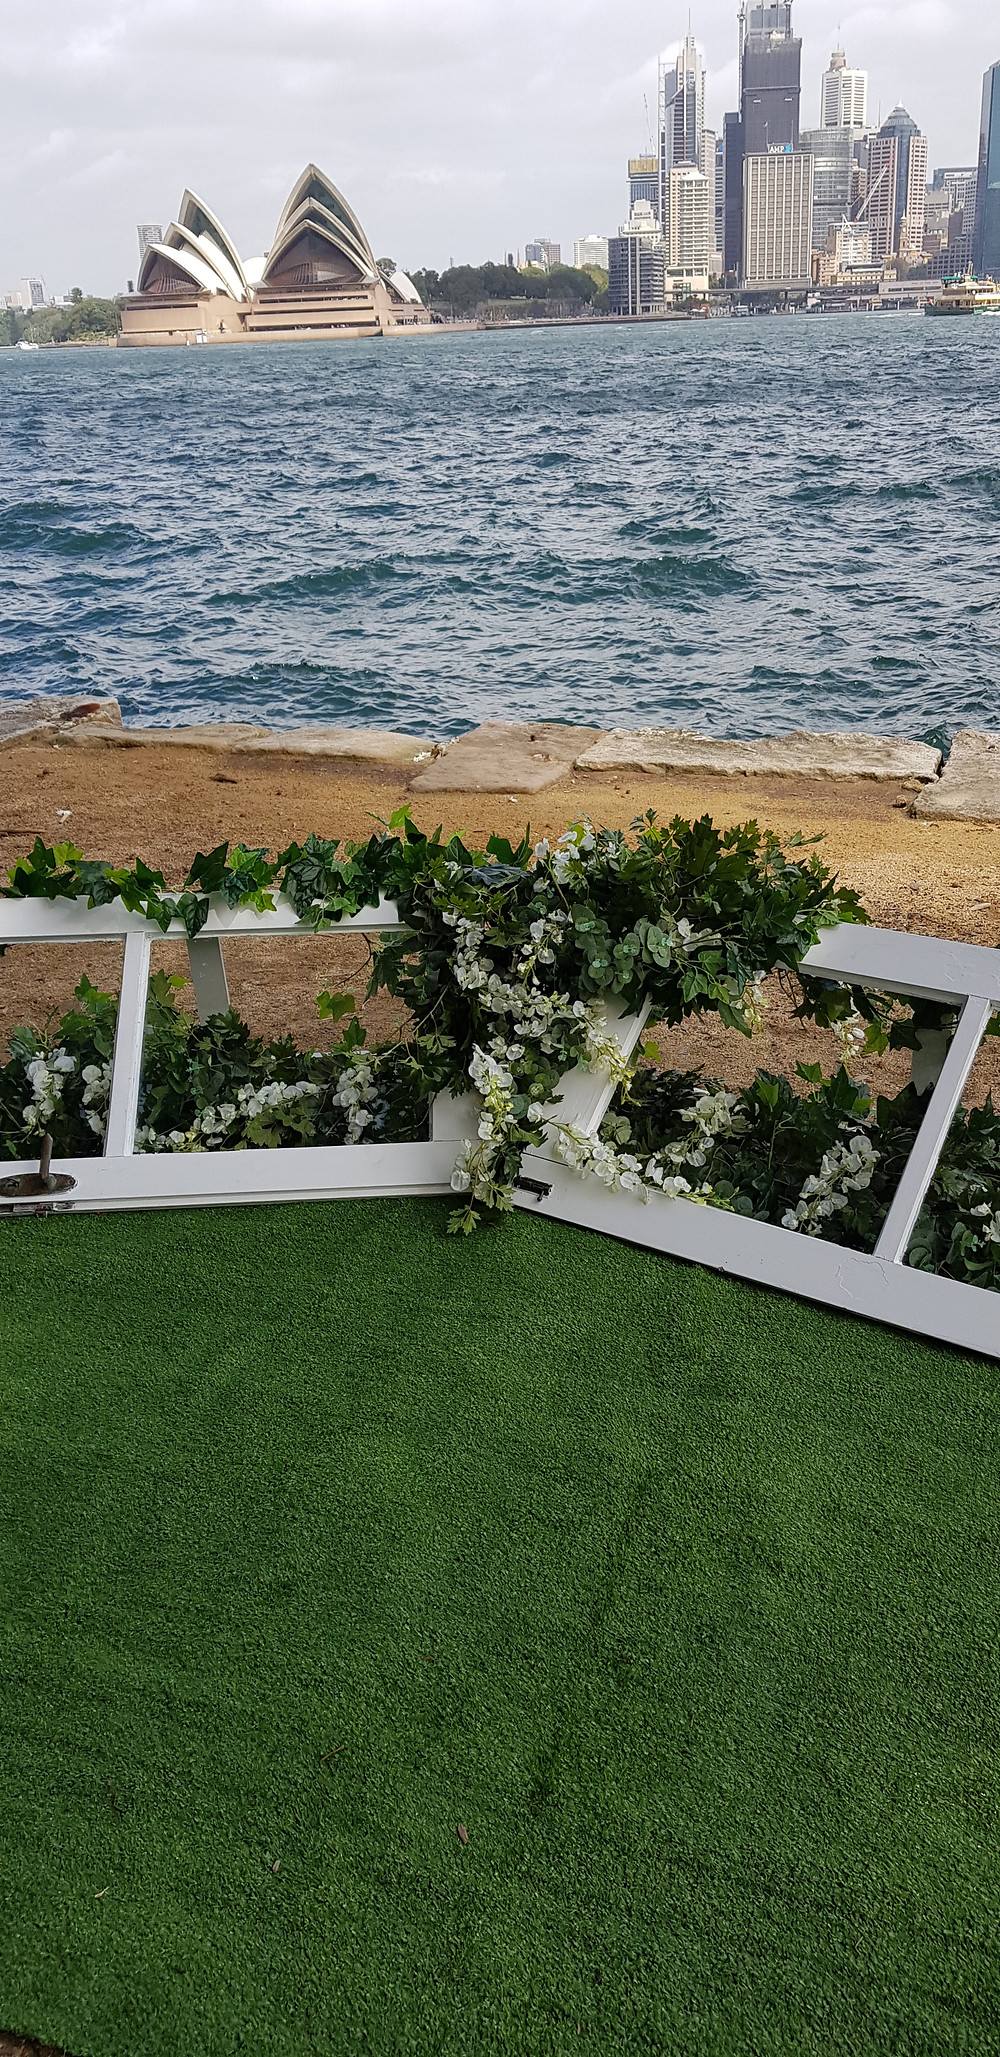 wedding ceremony, sitting pretty event hire, sydney skyline, sydney, weekend, vintage event hire